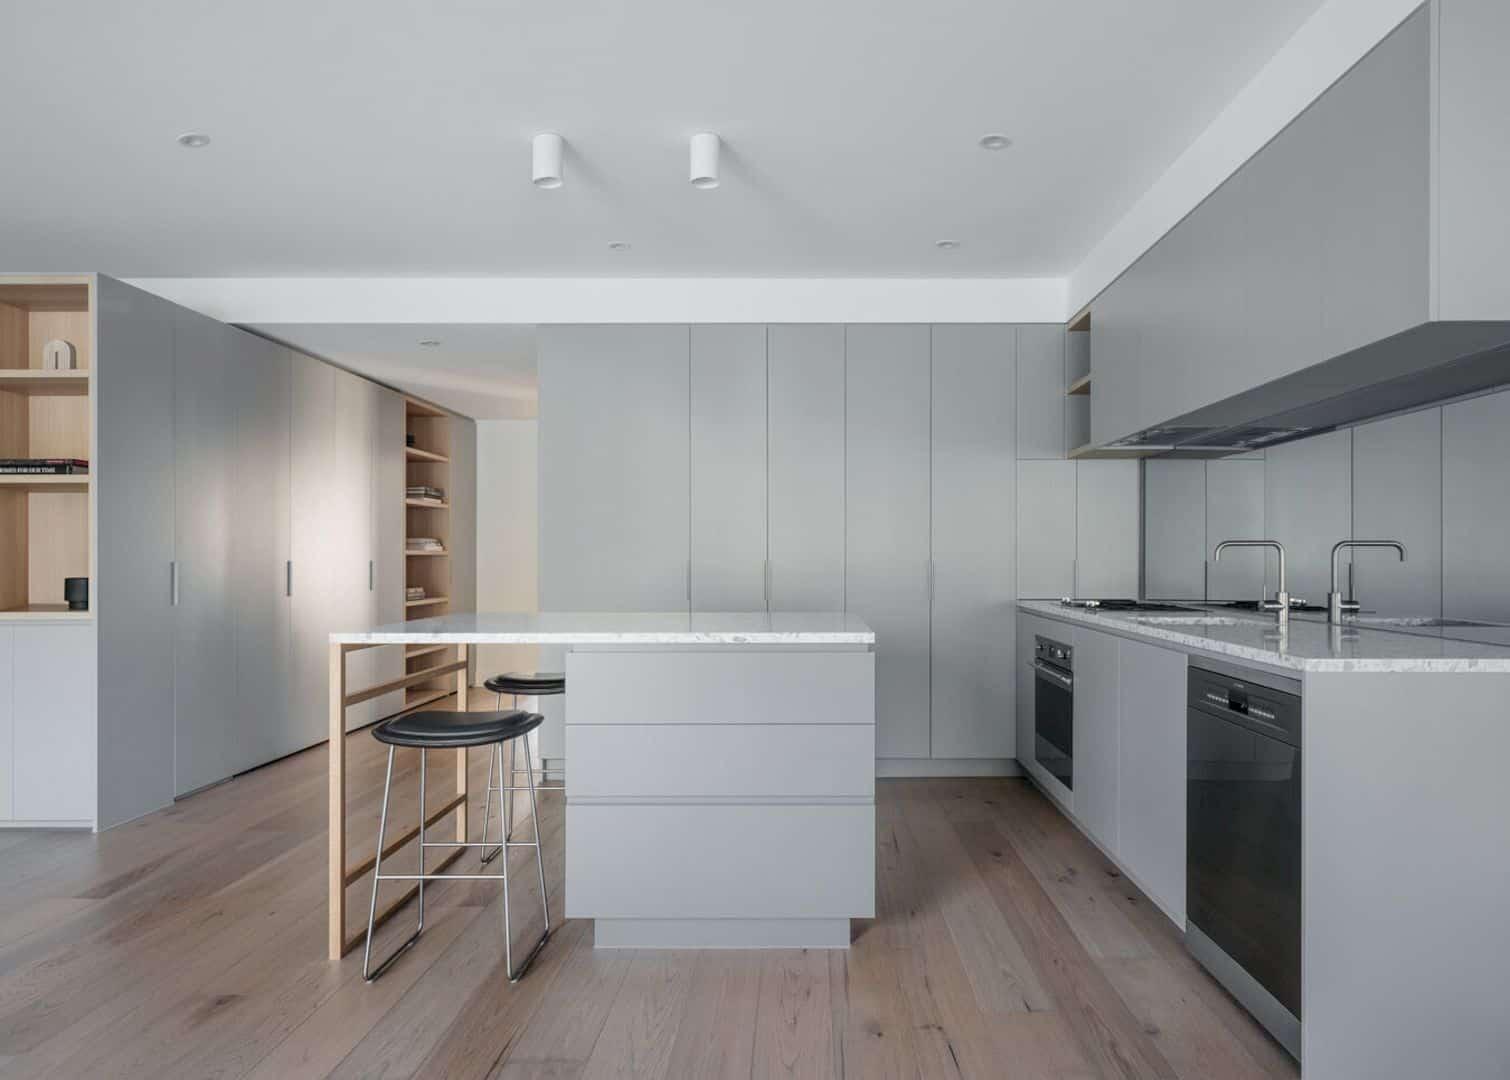 Carlton Apartment By Tom Eckersley Architects 9